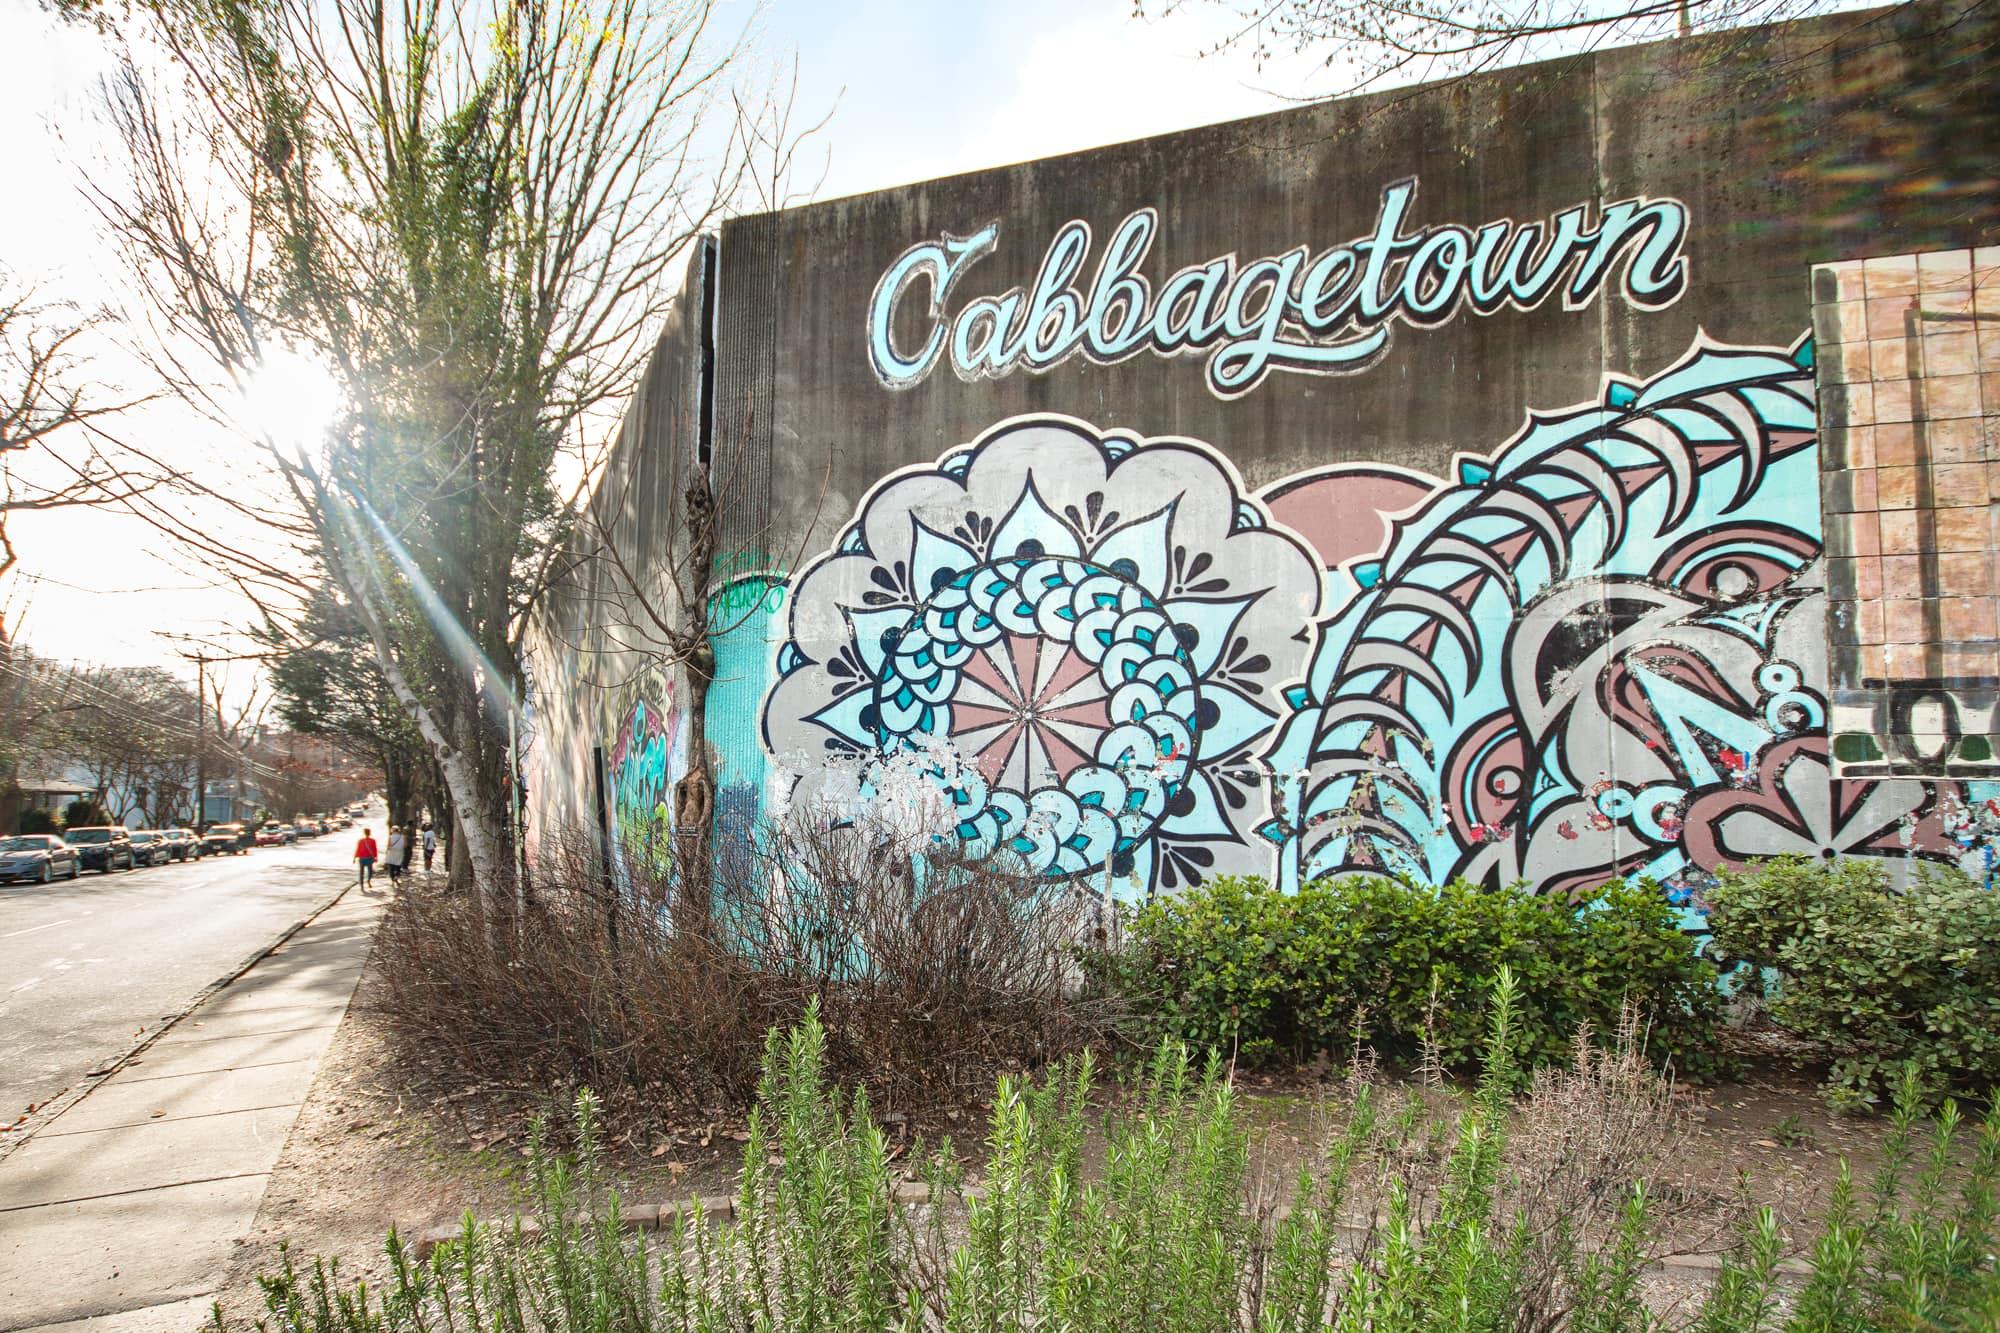 Photo of Cabbagetown wall art.